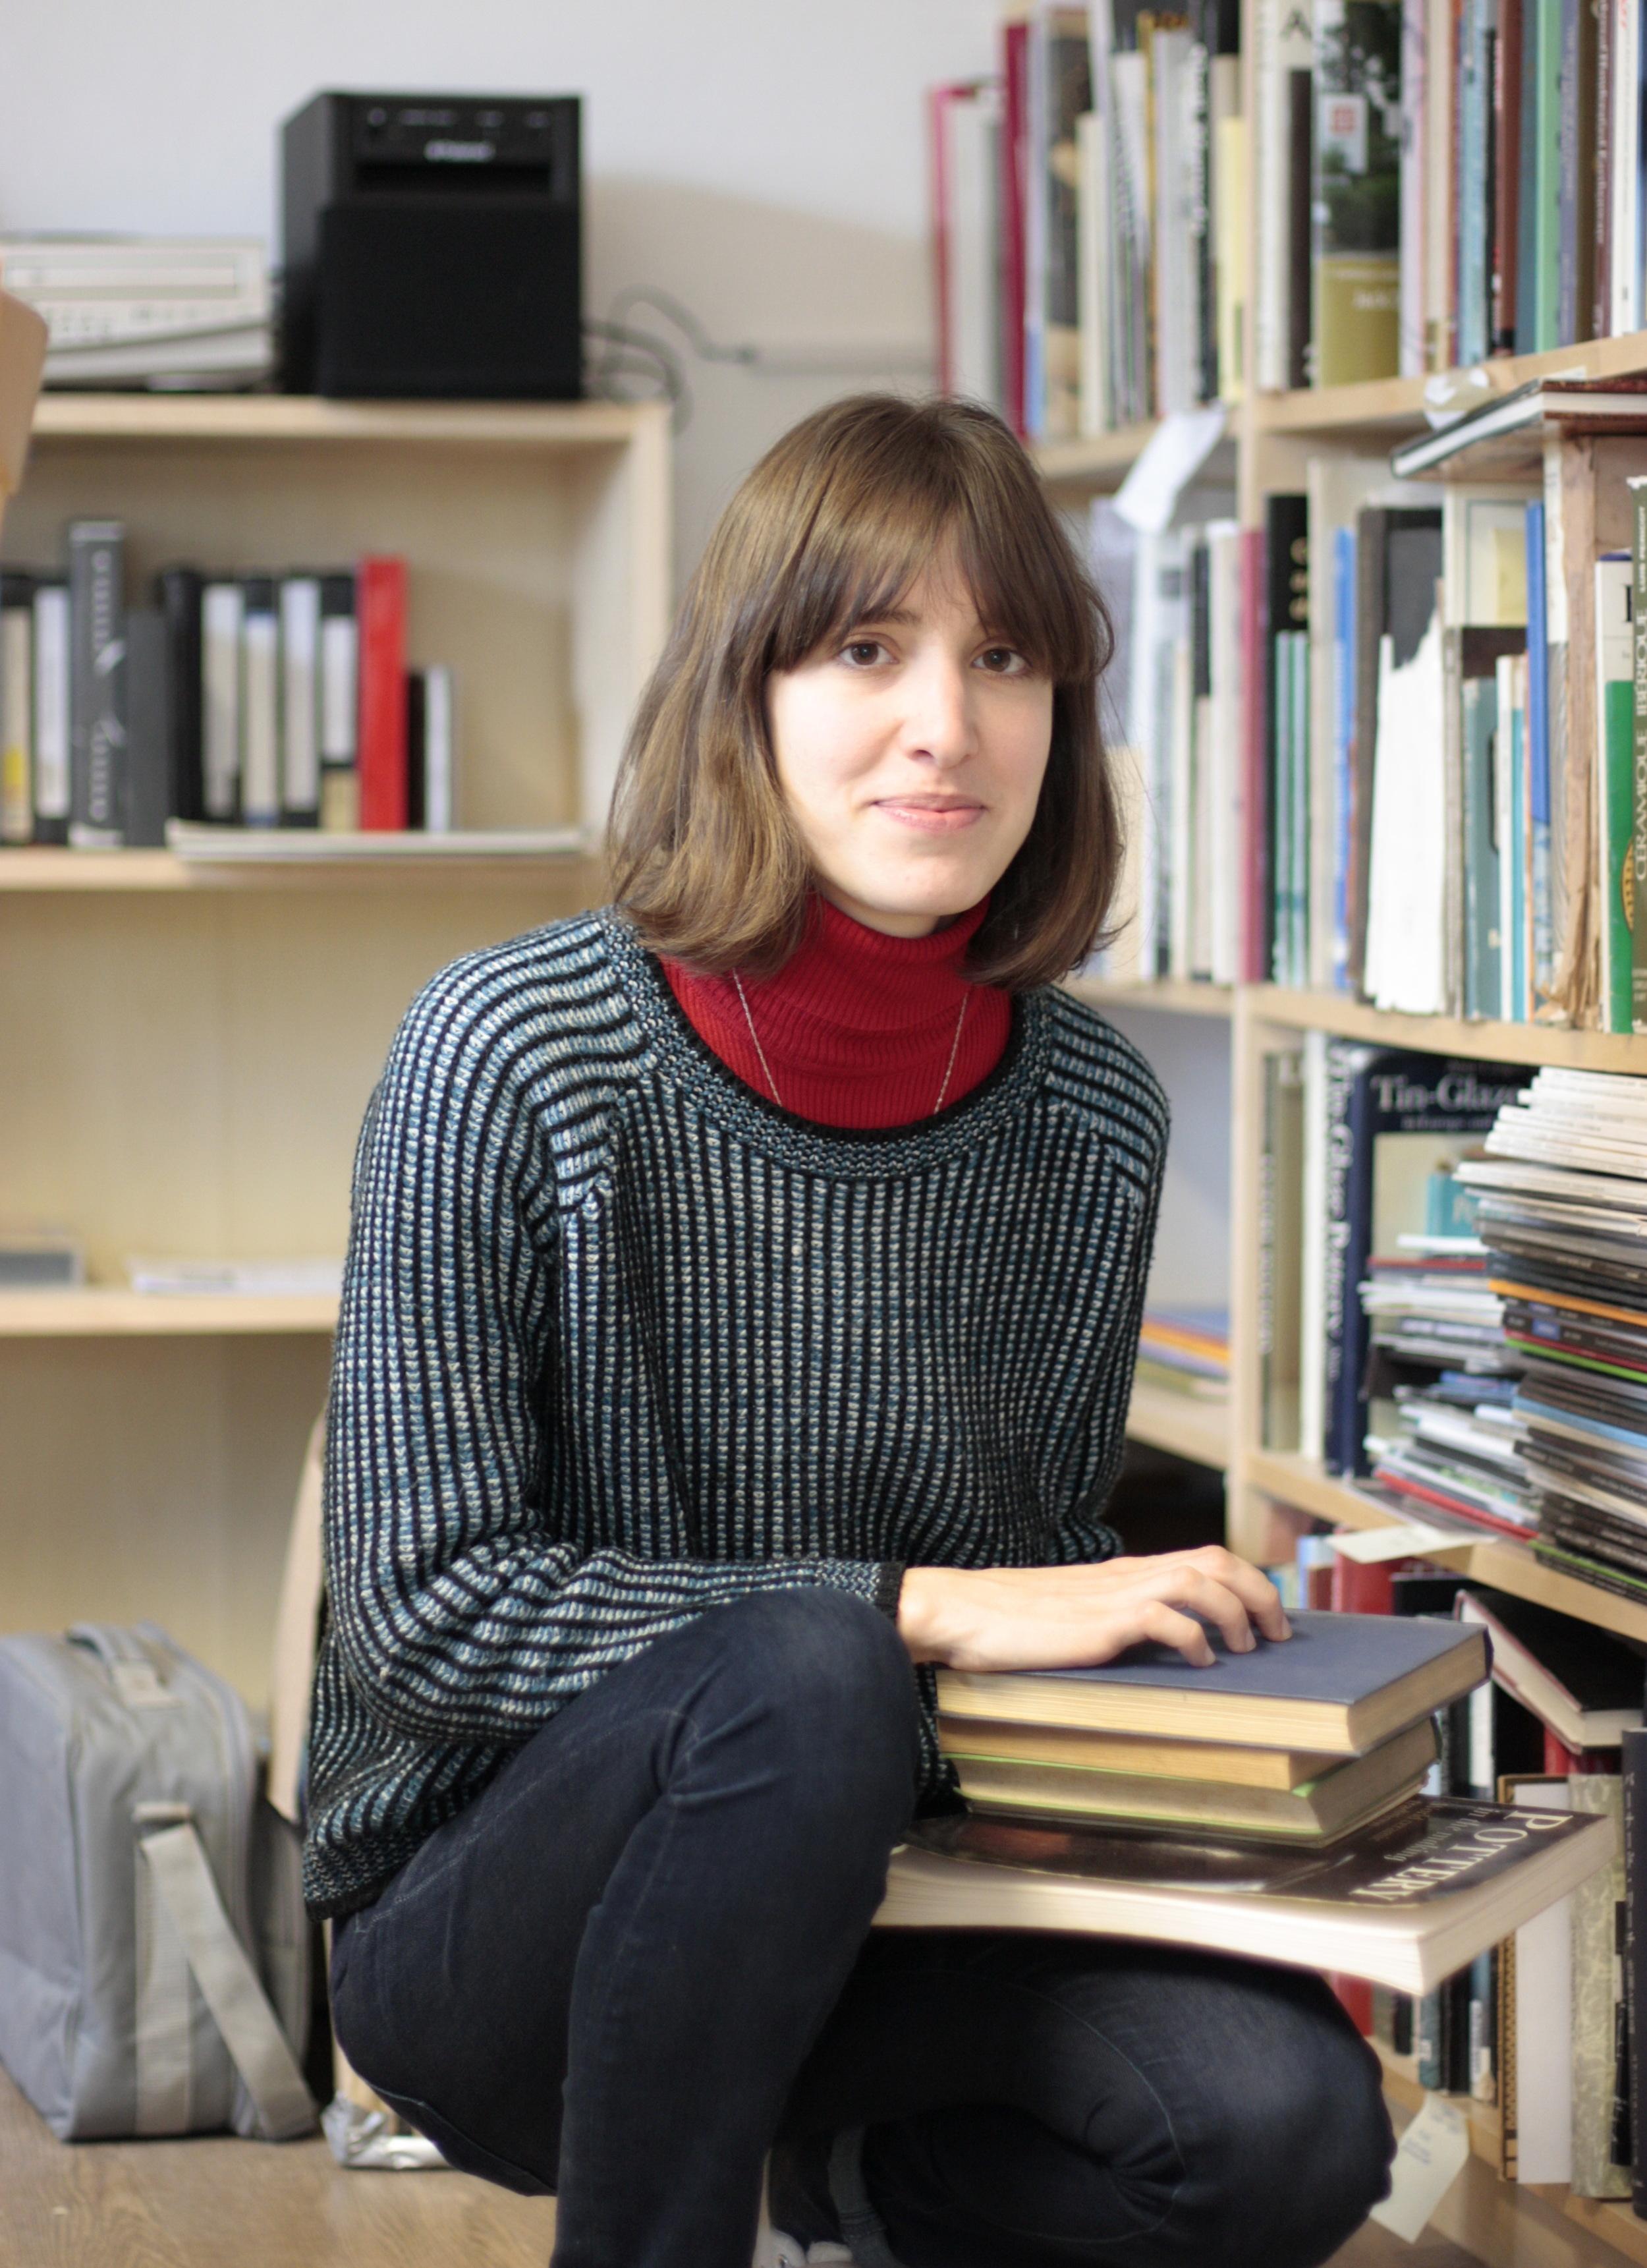 Cecilia Levratto in the library at Beagle Cross. Photo by John Bedding